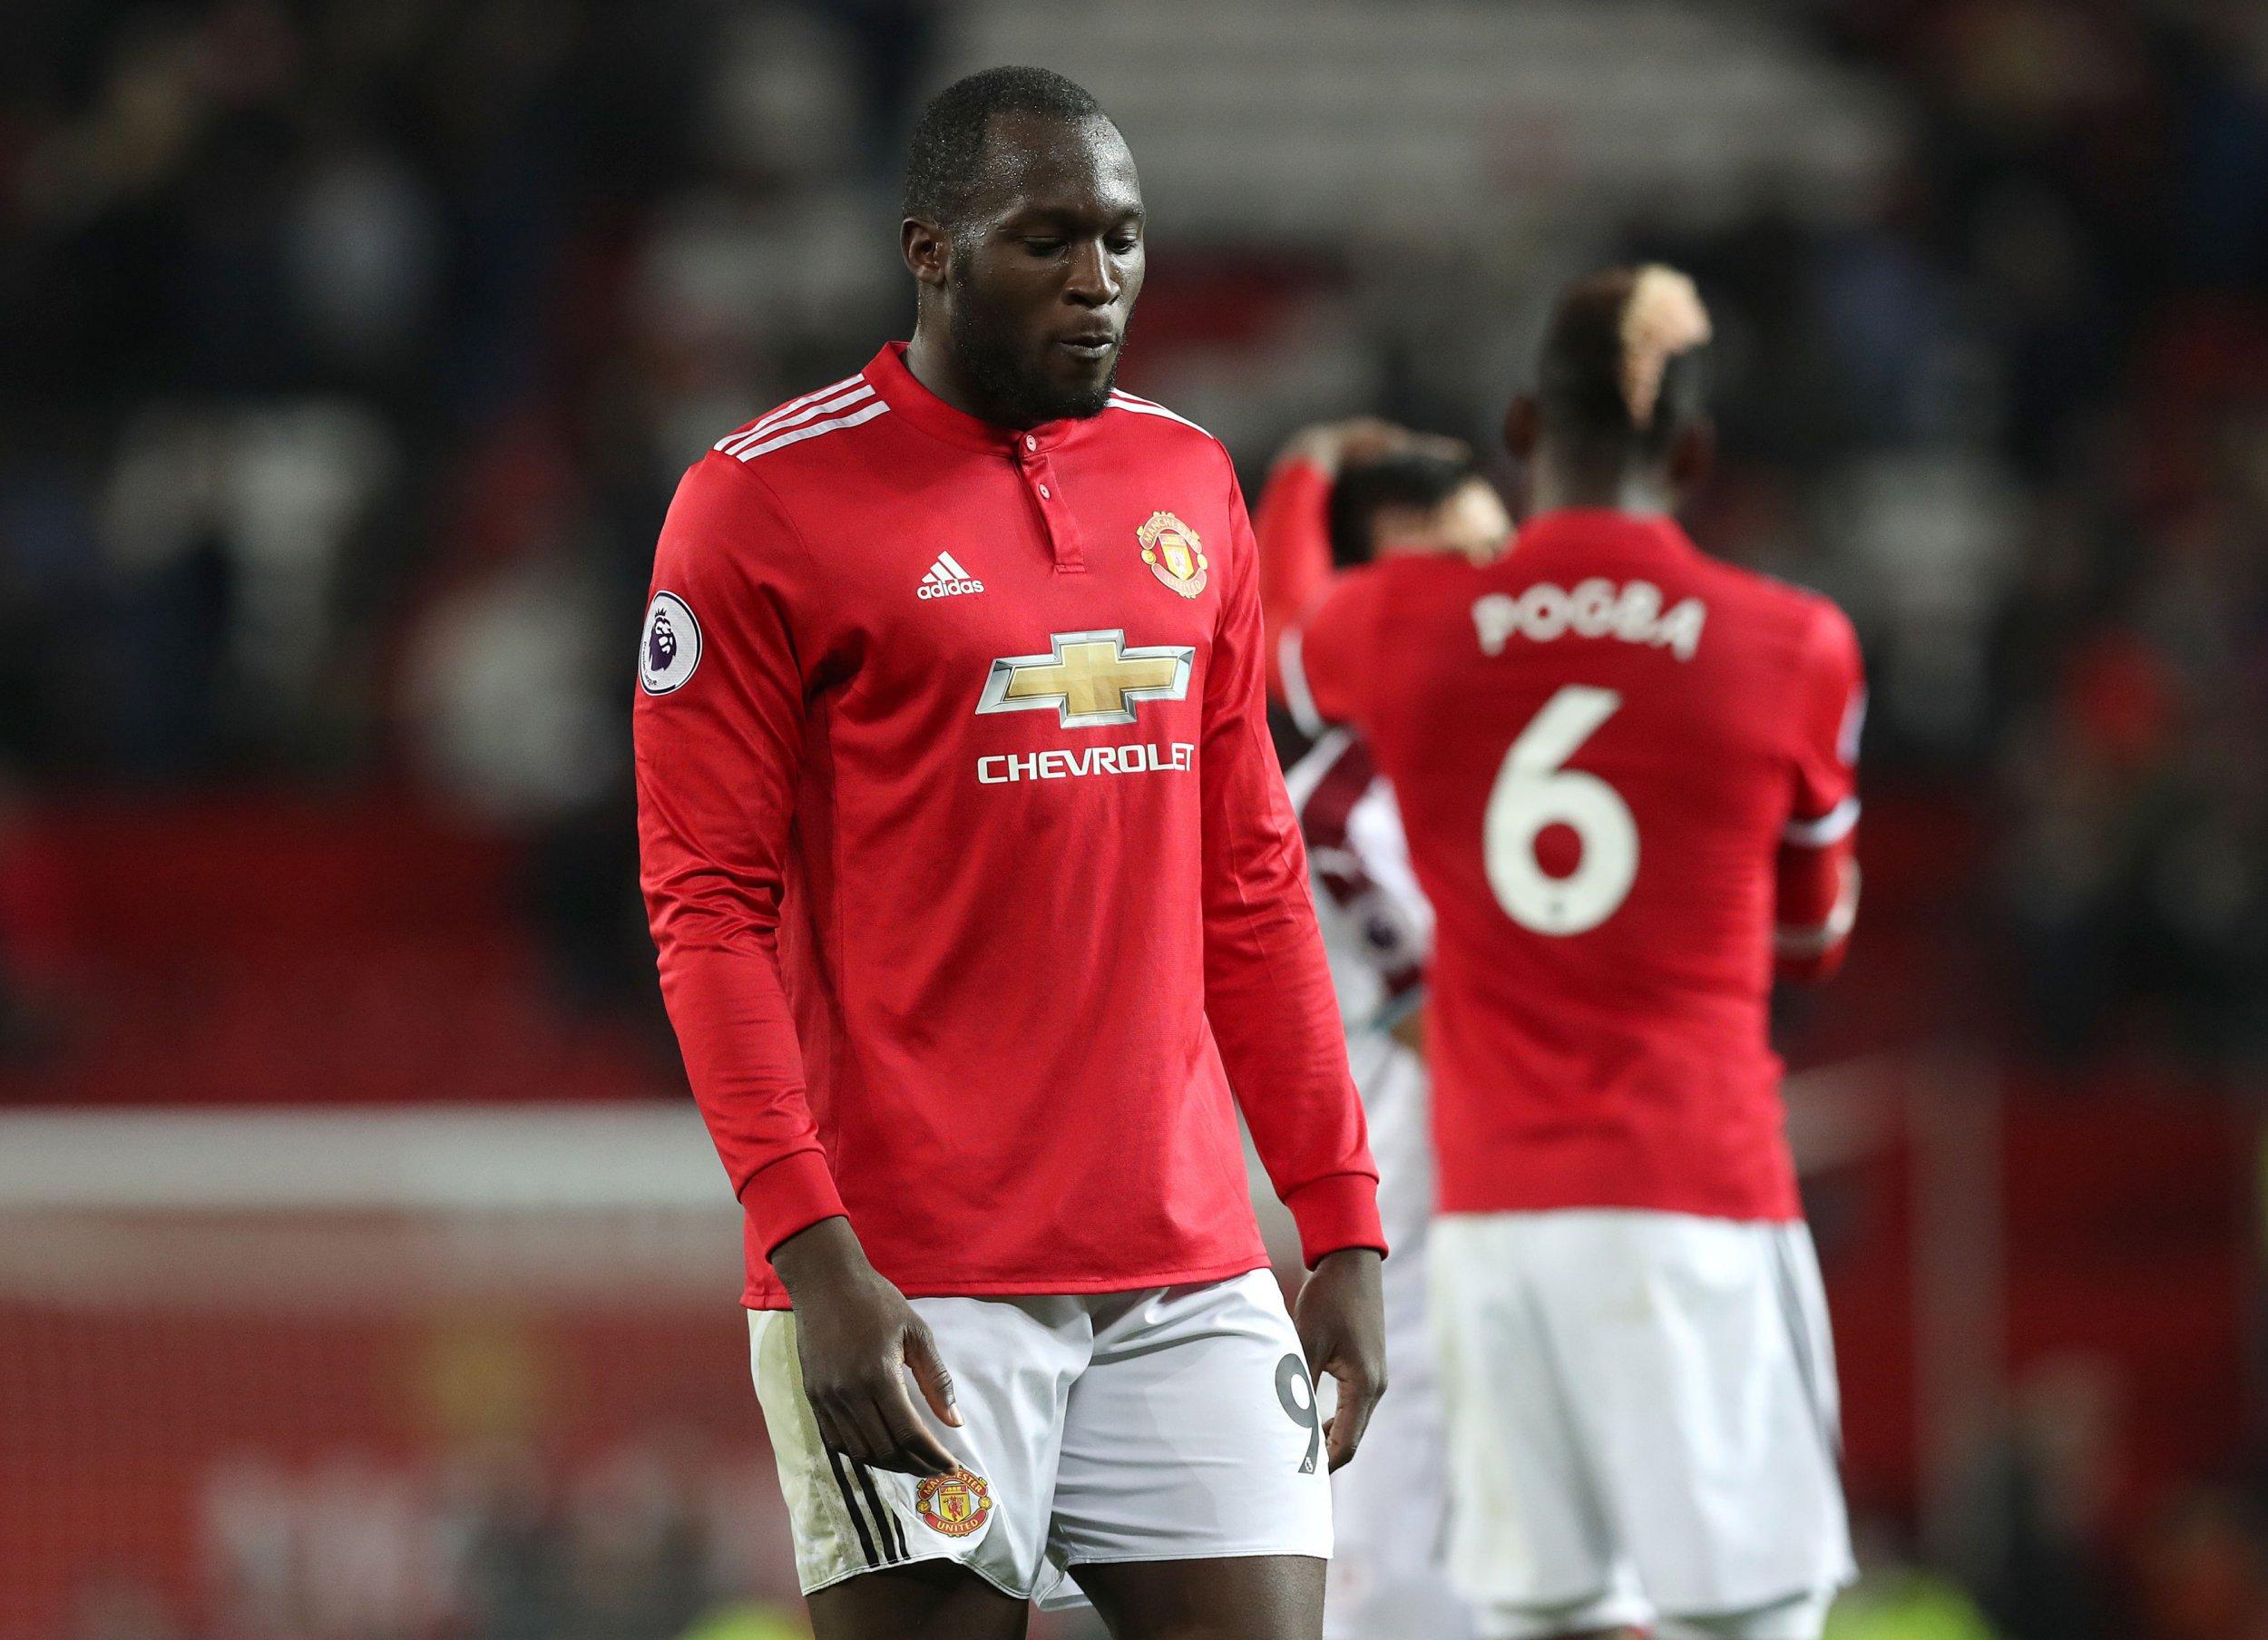 Jose Mourinho expects Manchester United star Romelu Lukaku to miss another week